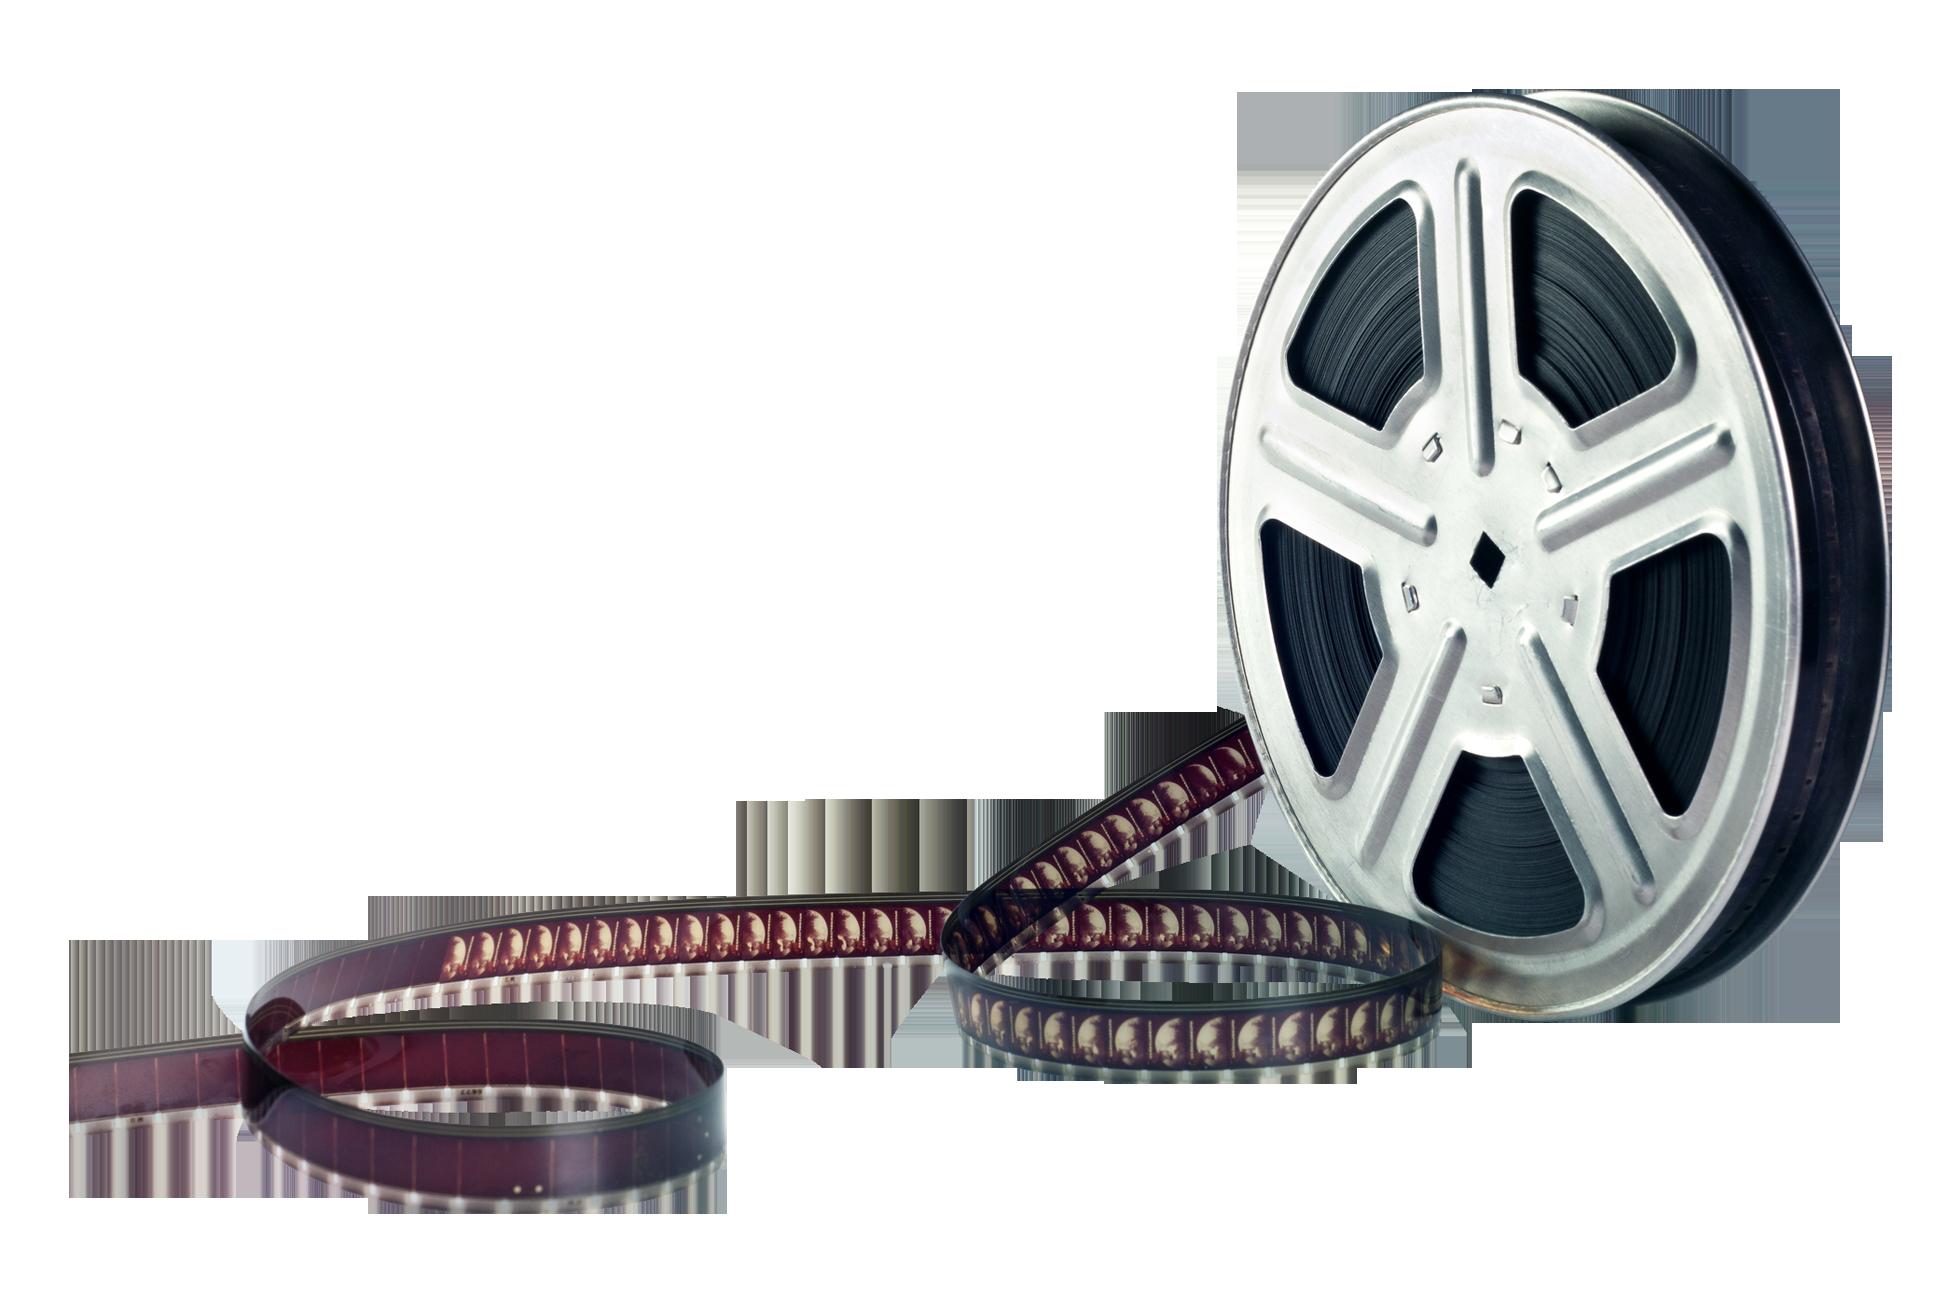 Film Reel PNG - 64805